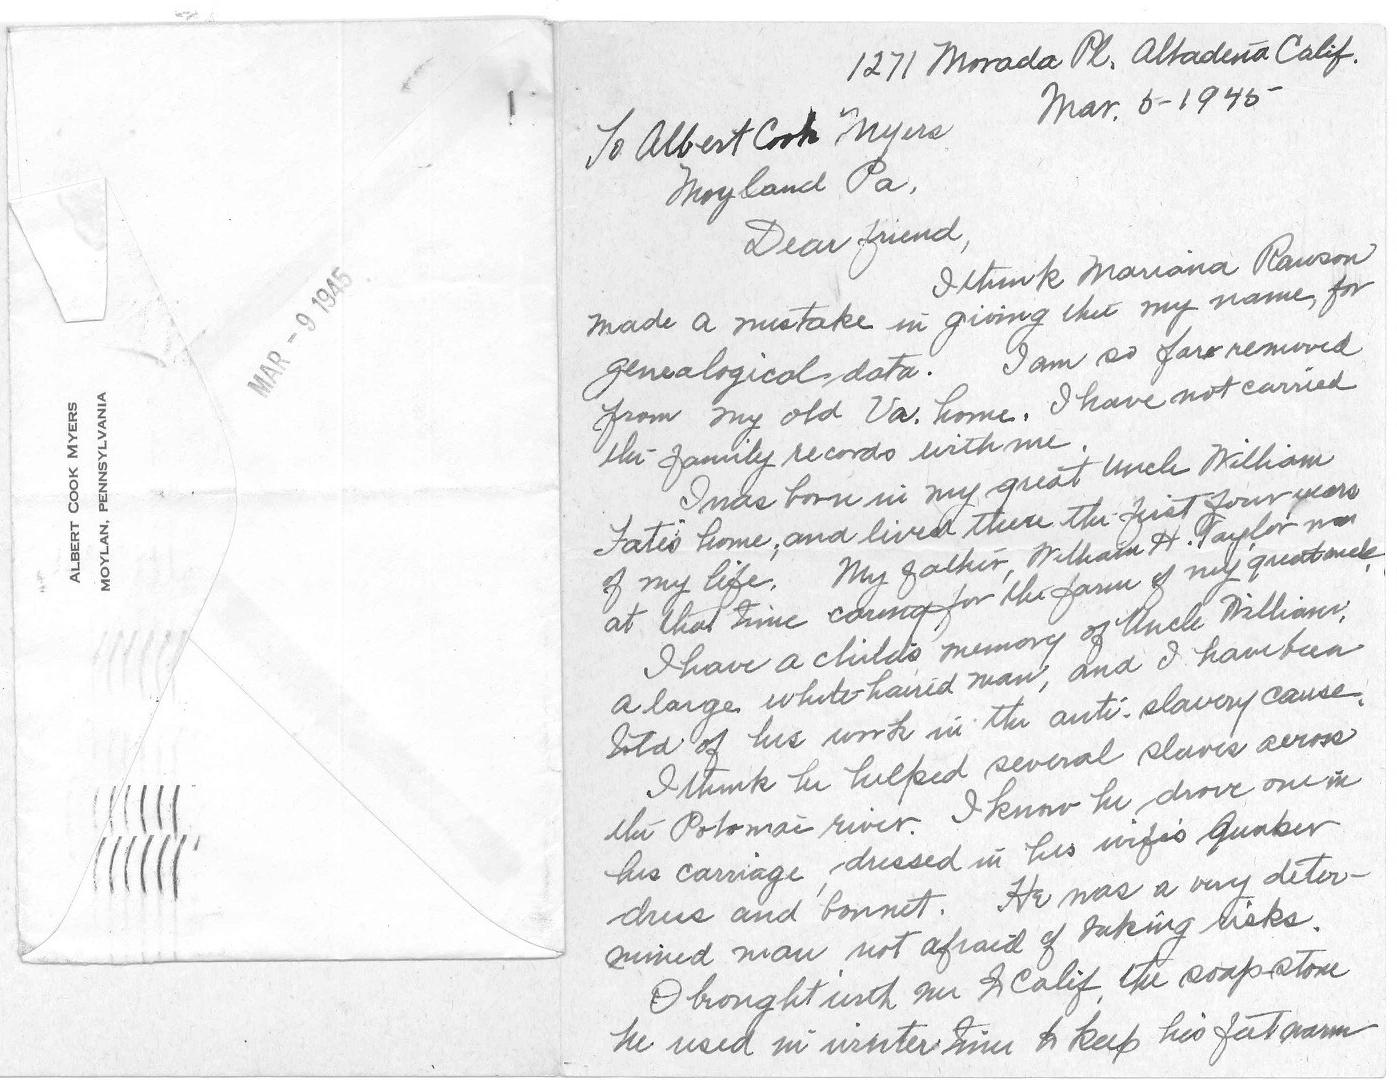 carolyn-taylor-1945-letter-re-tates.jpg